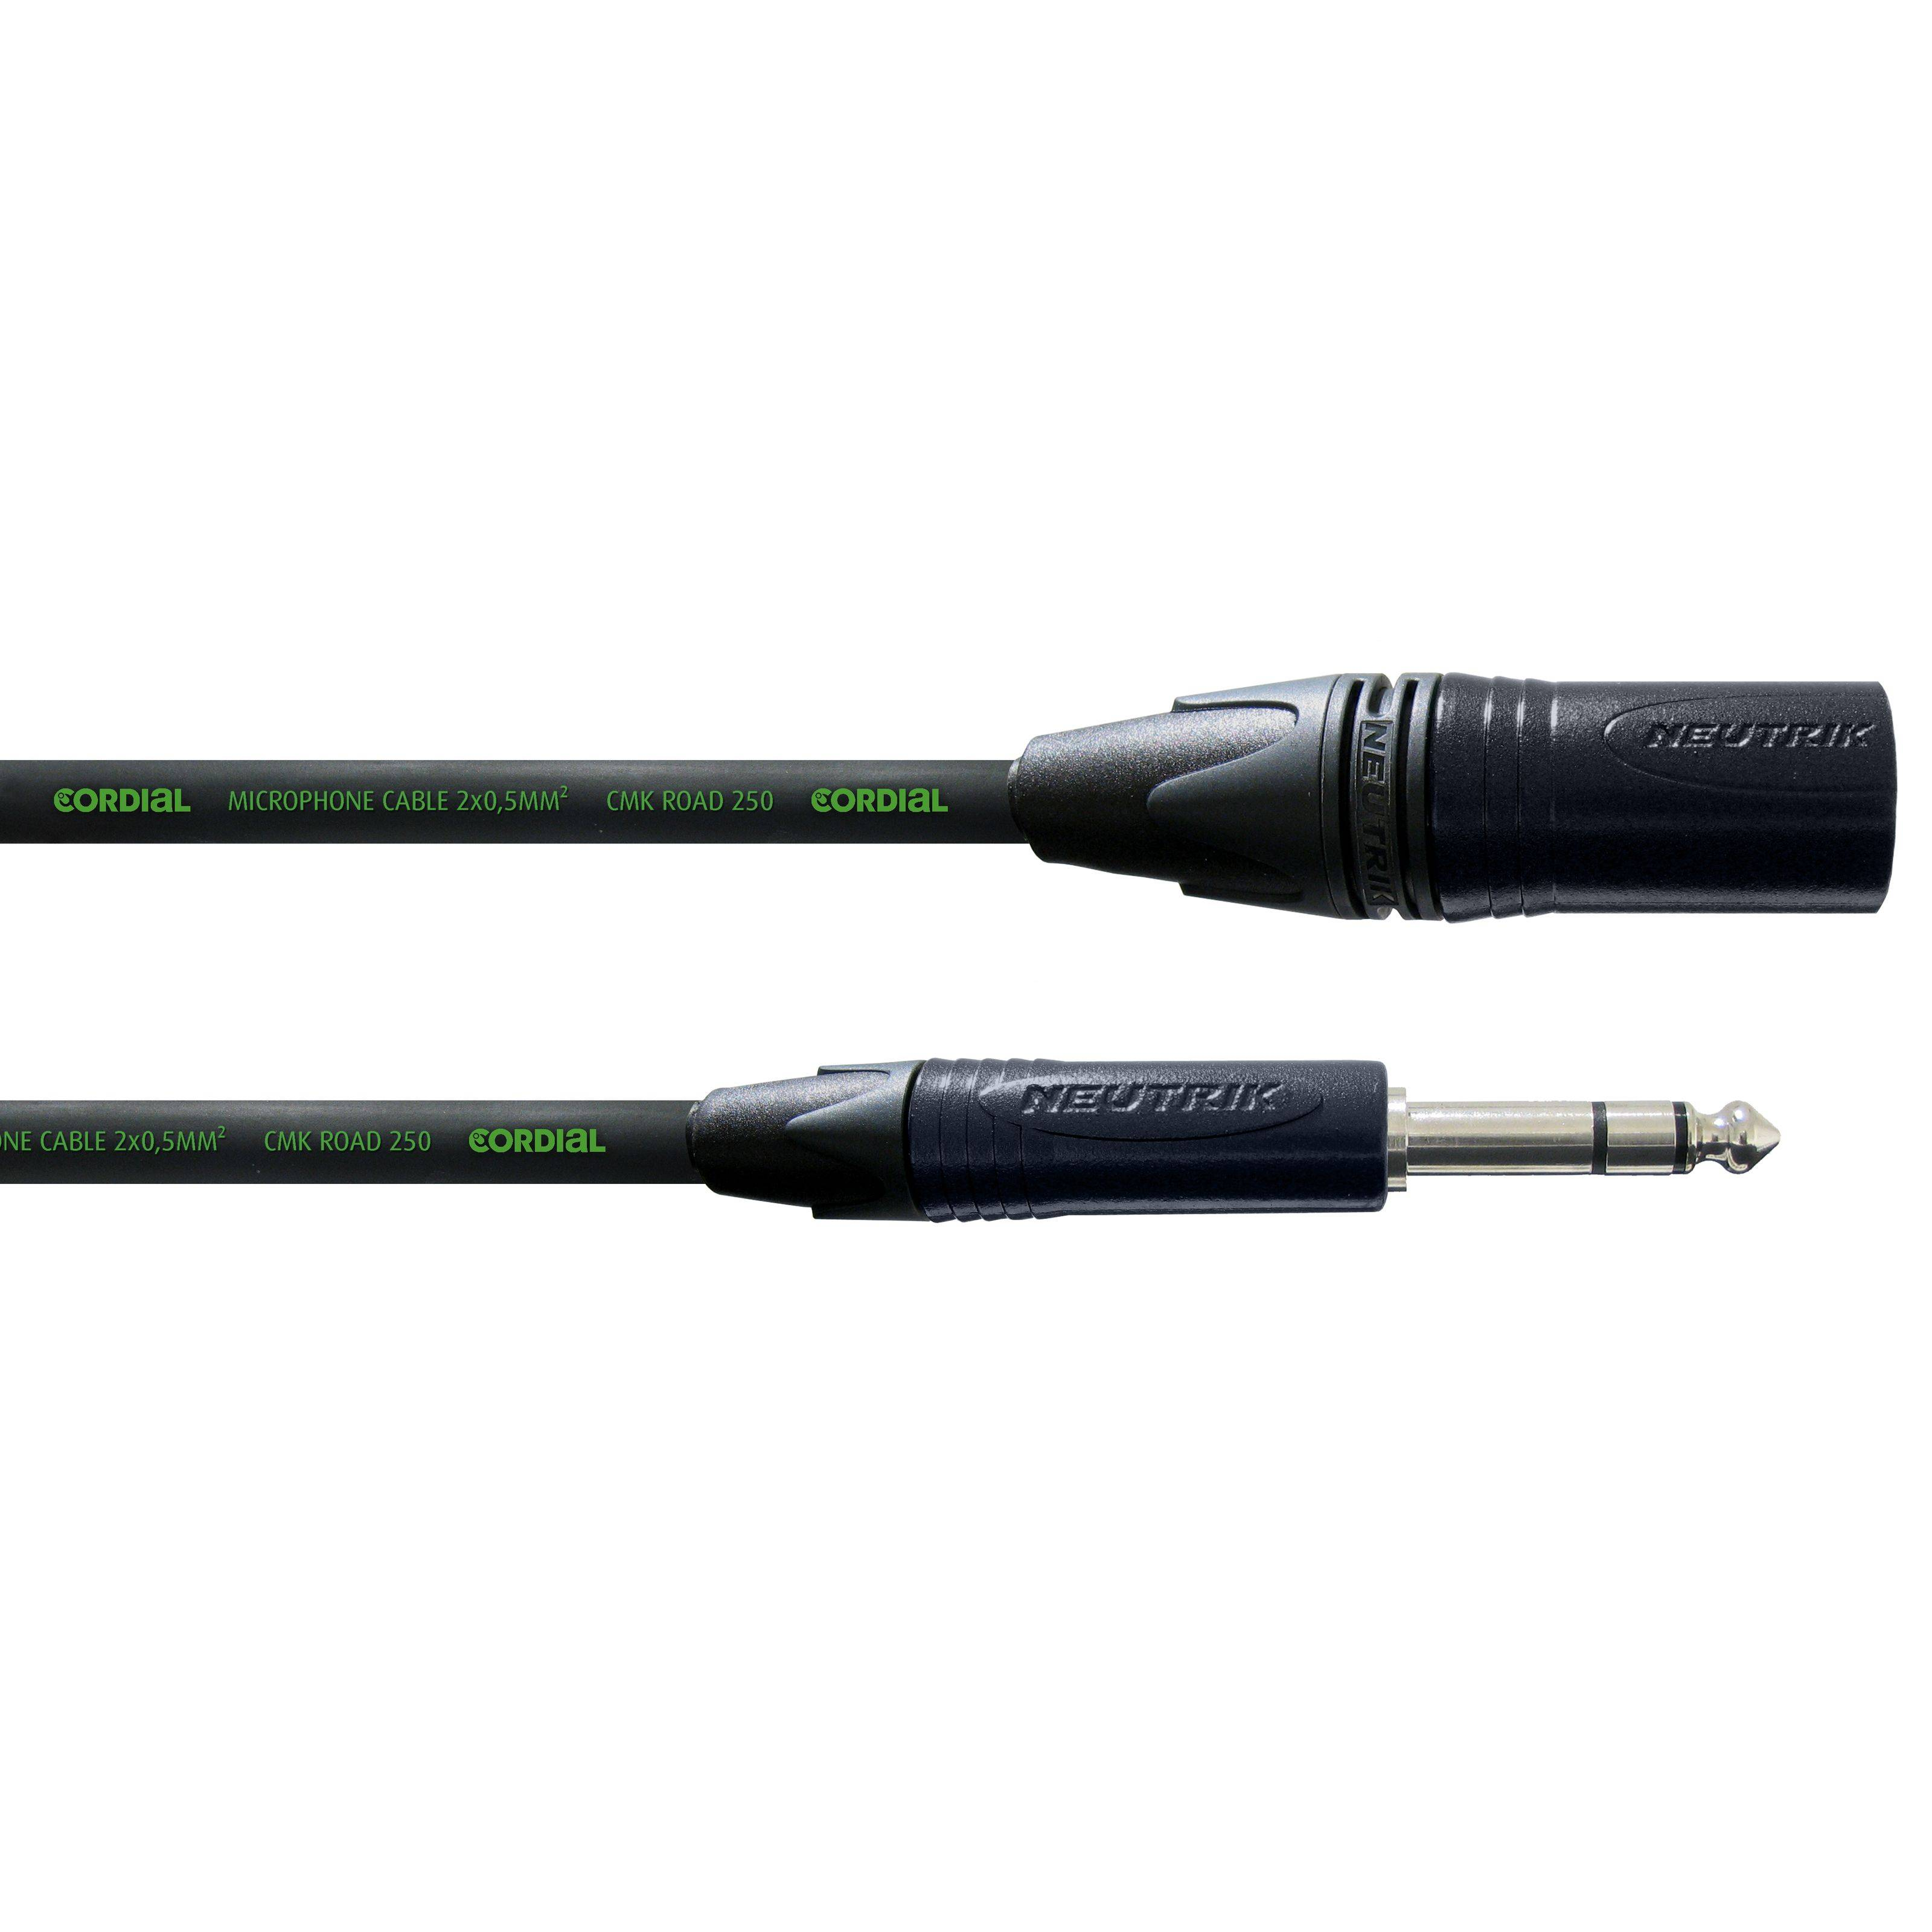 Cordial CRM 2.5 MV encore Mircophone Cable XLR male - Jack stereo 2,5m Neutrik